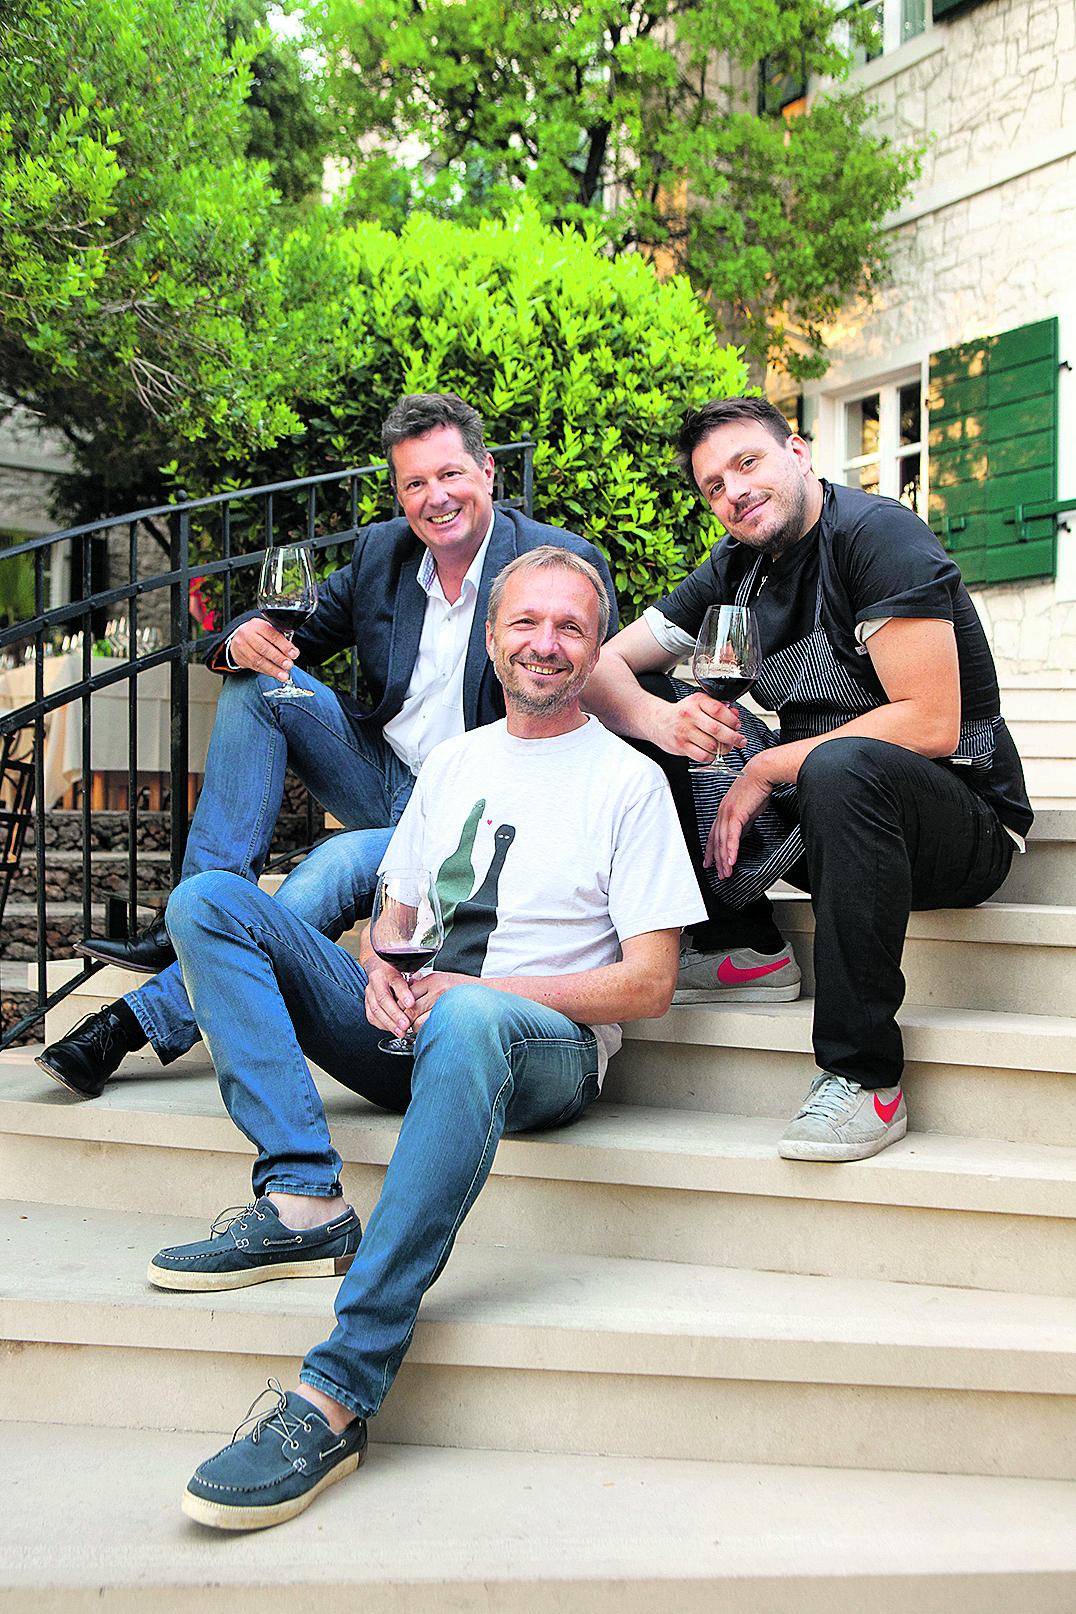 restoran vinarija i hotel Boskinac 19052017 Vecera Mate Jankovic i vina Ivica Matosevic i Boris Suljic Foto Mario Kucera